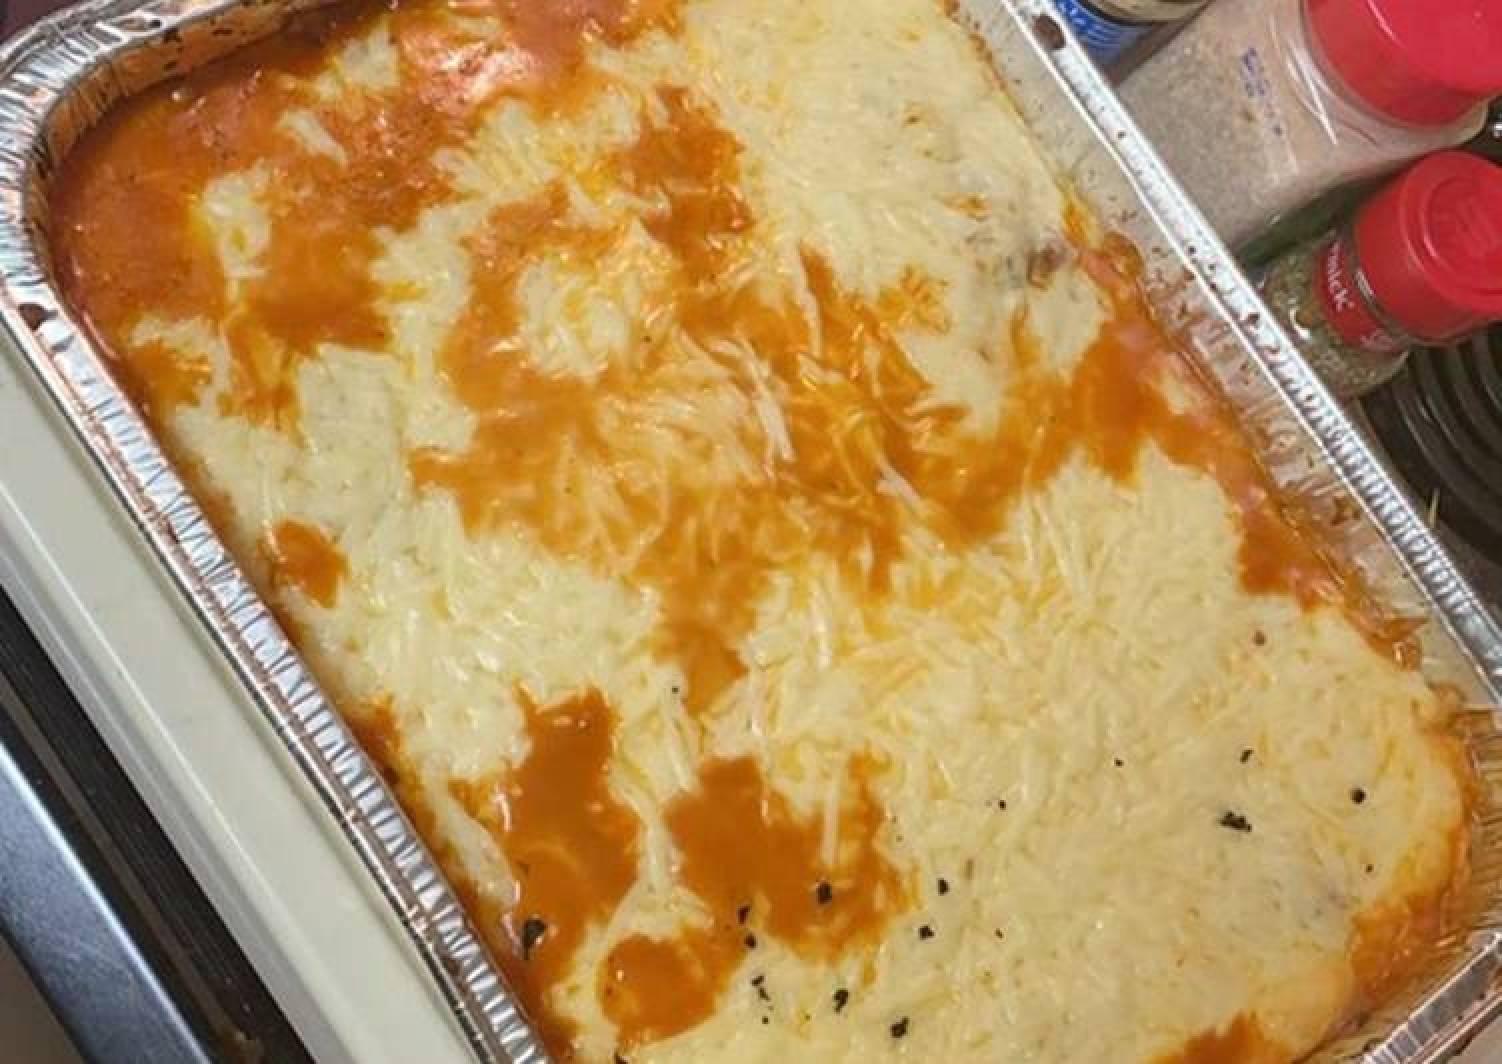 Smoked Venison Spaghetti